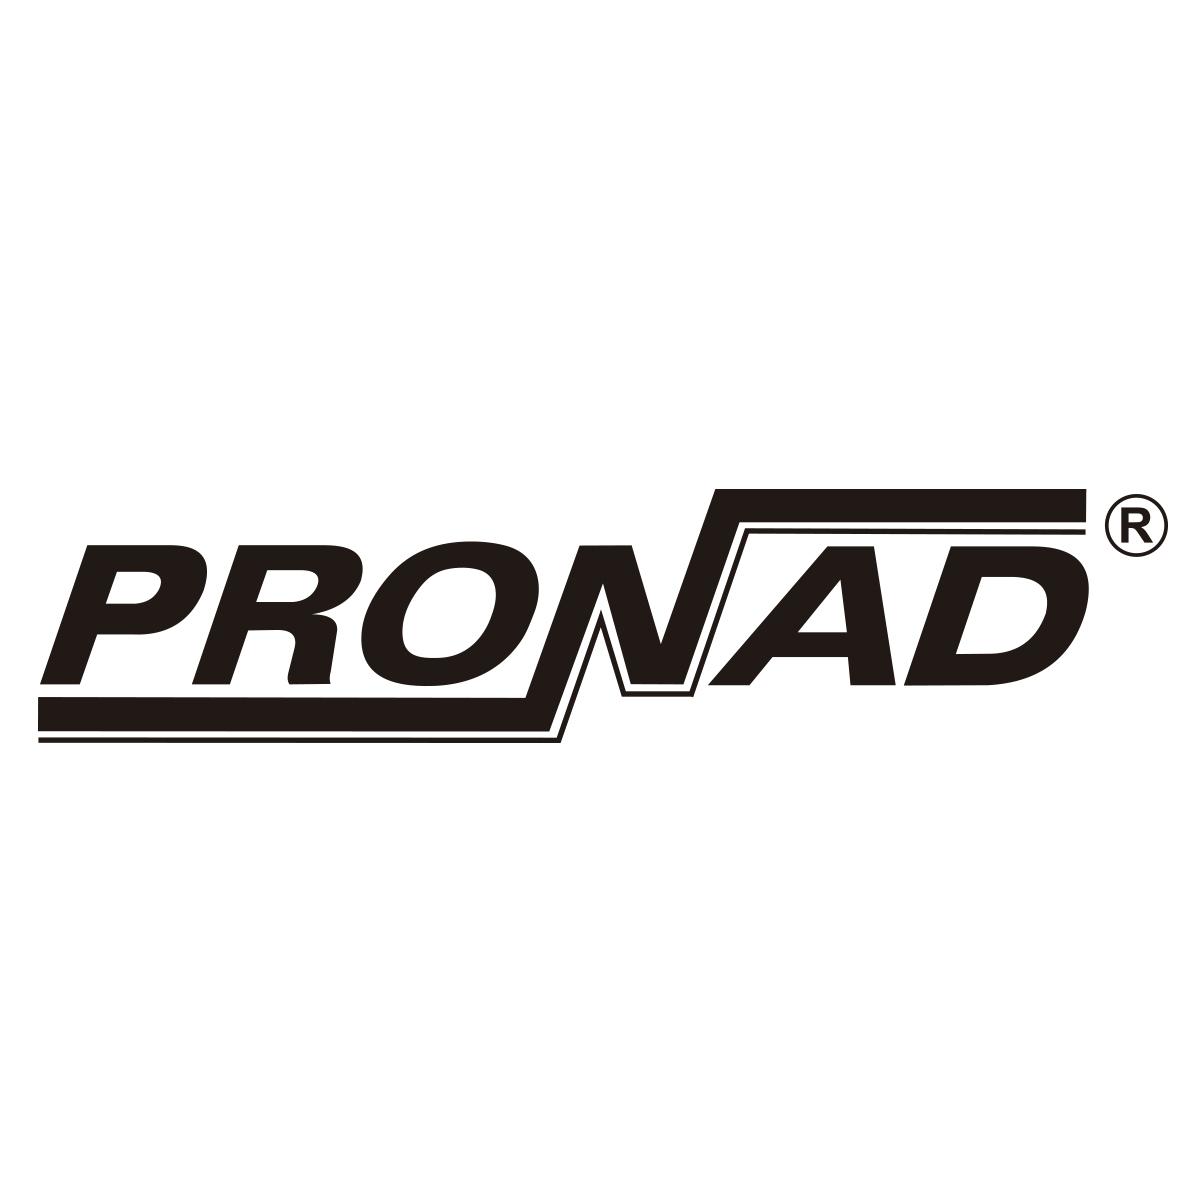 pronad www